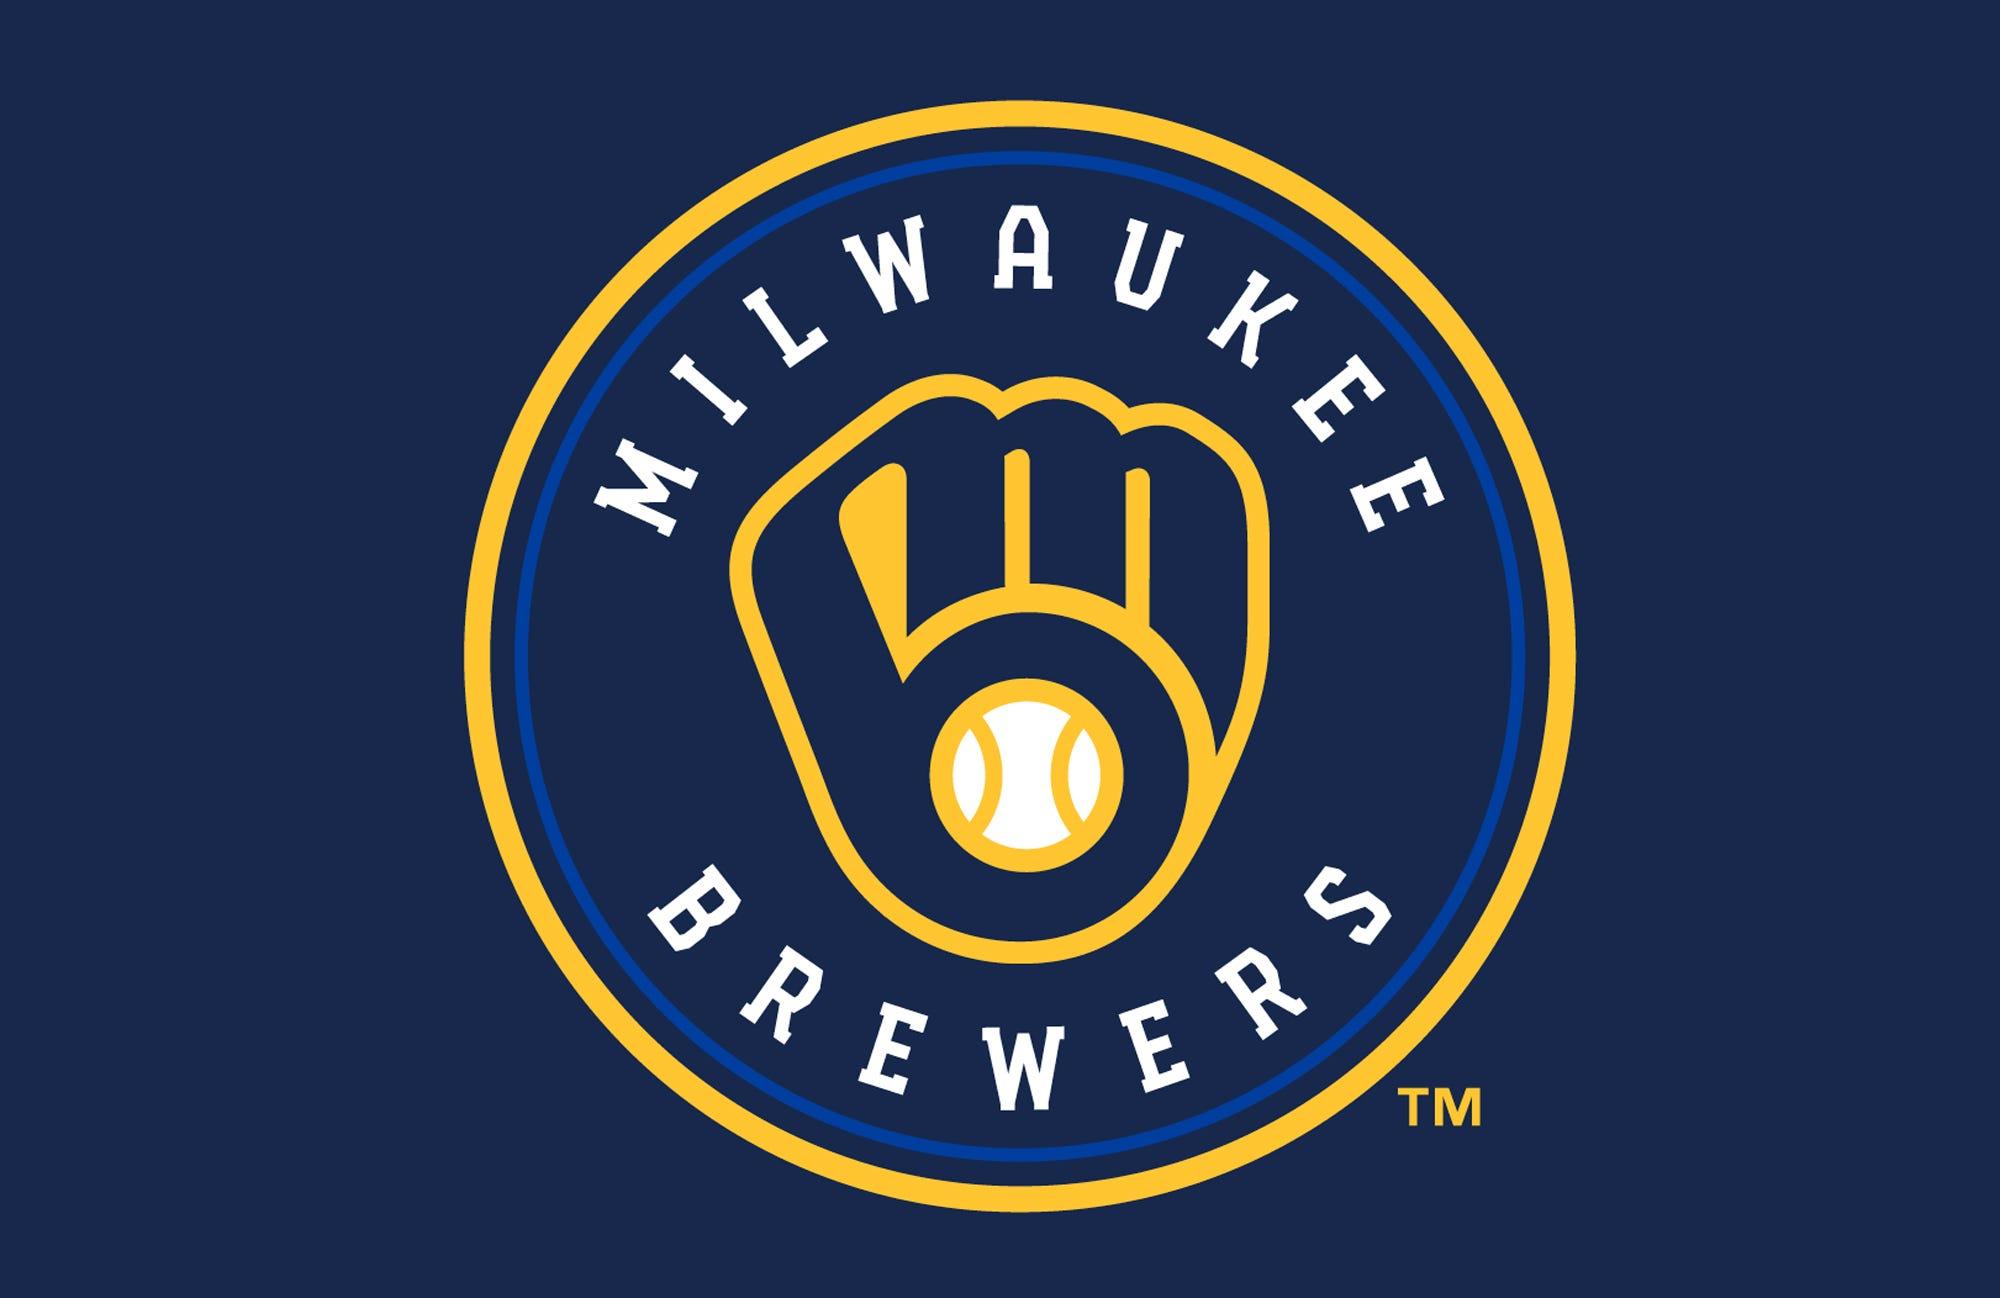 Milwaukee Brewers bring back popular ball-in-glove logo, unveil new uniform designs